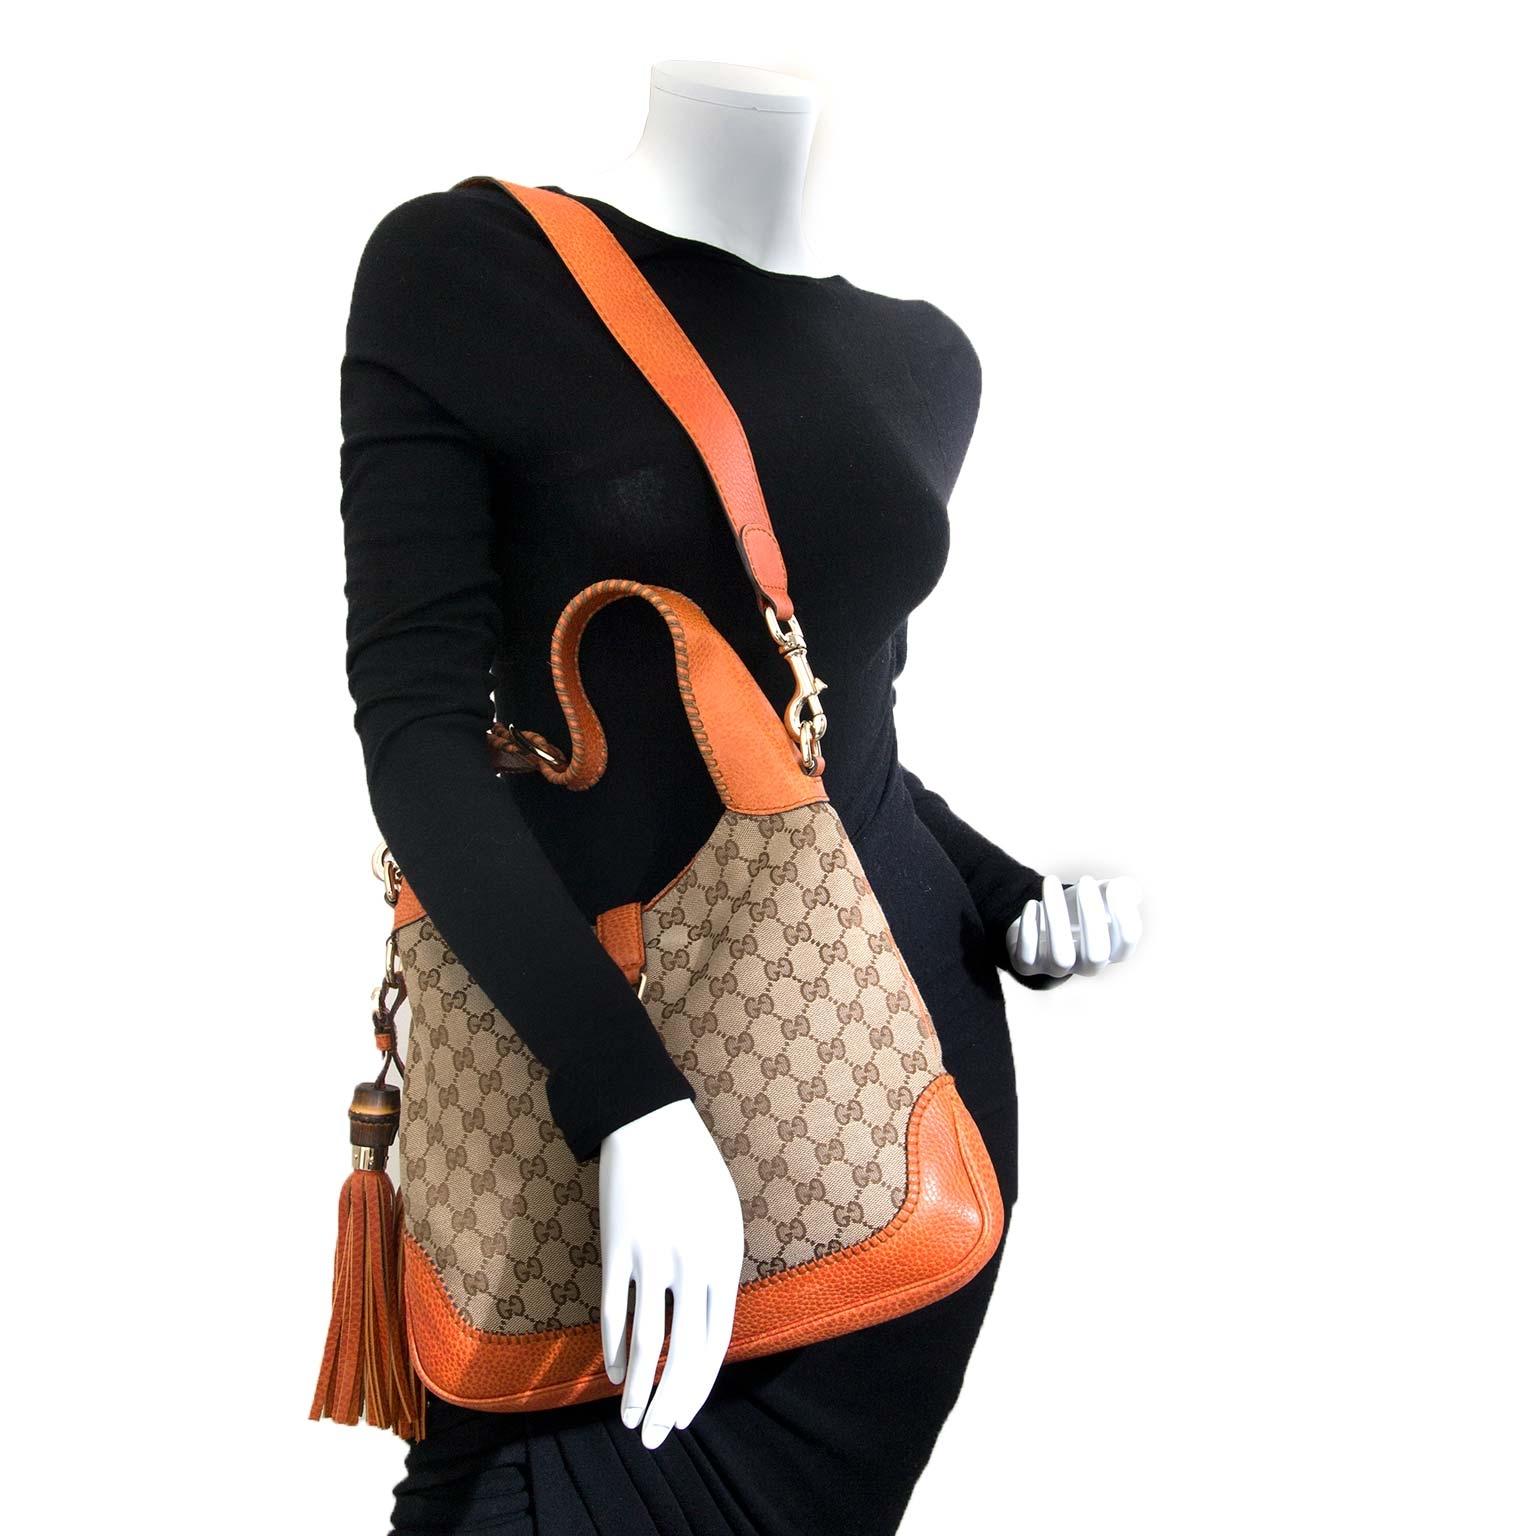 ab372284ef2e ... sale at labellov vintage fashion webshop belgium gucci jackie monogram  hobo tas nu te koop bij labellov vintage mode webshop belgië